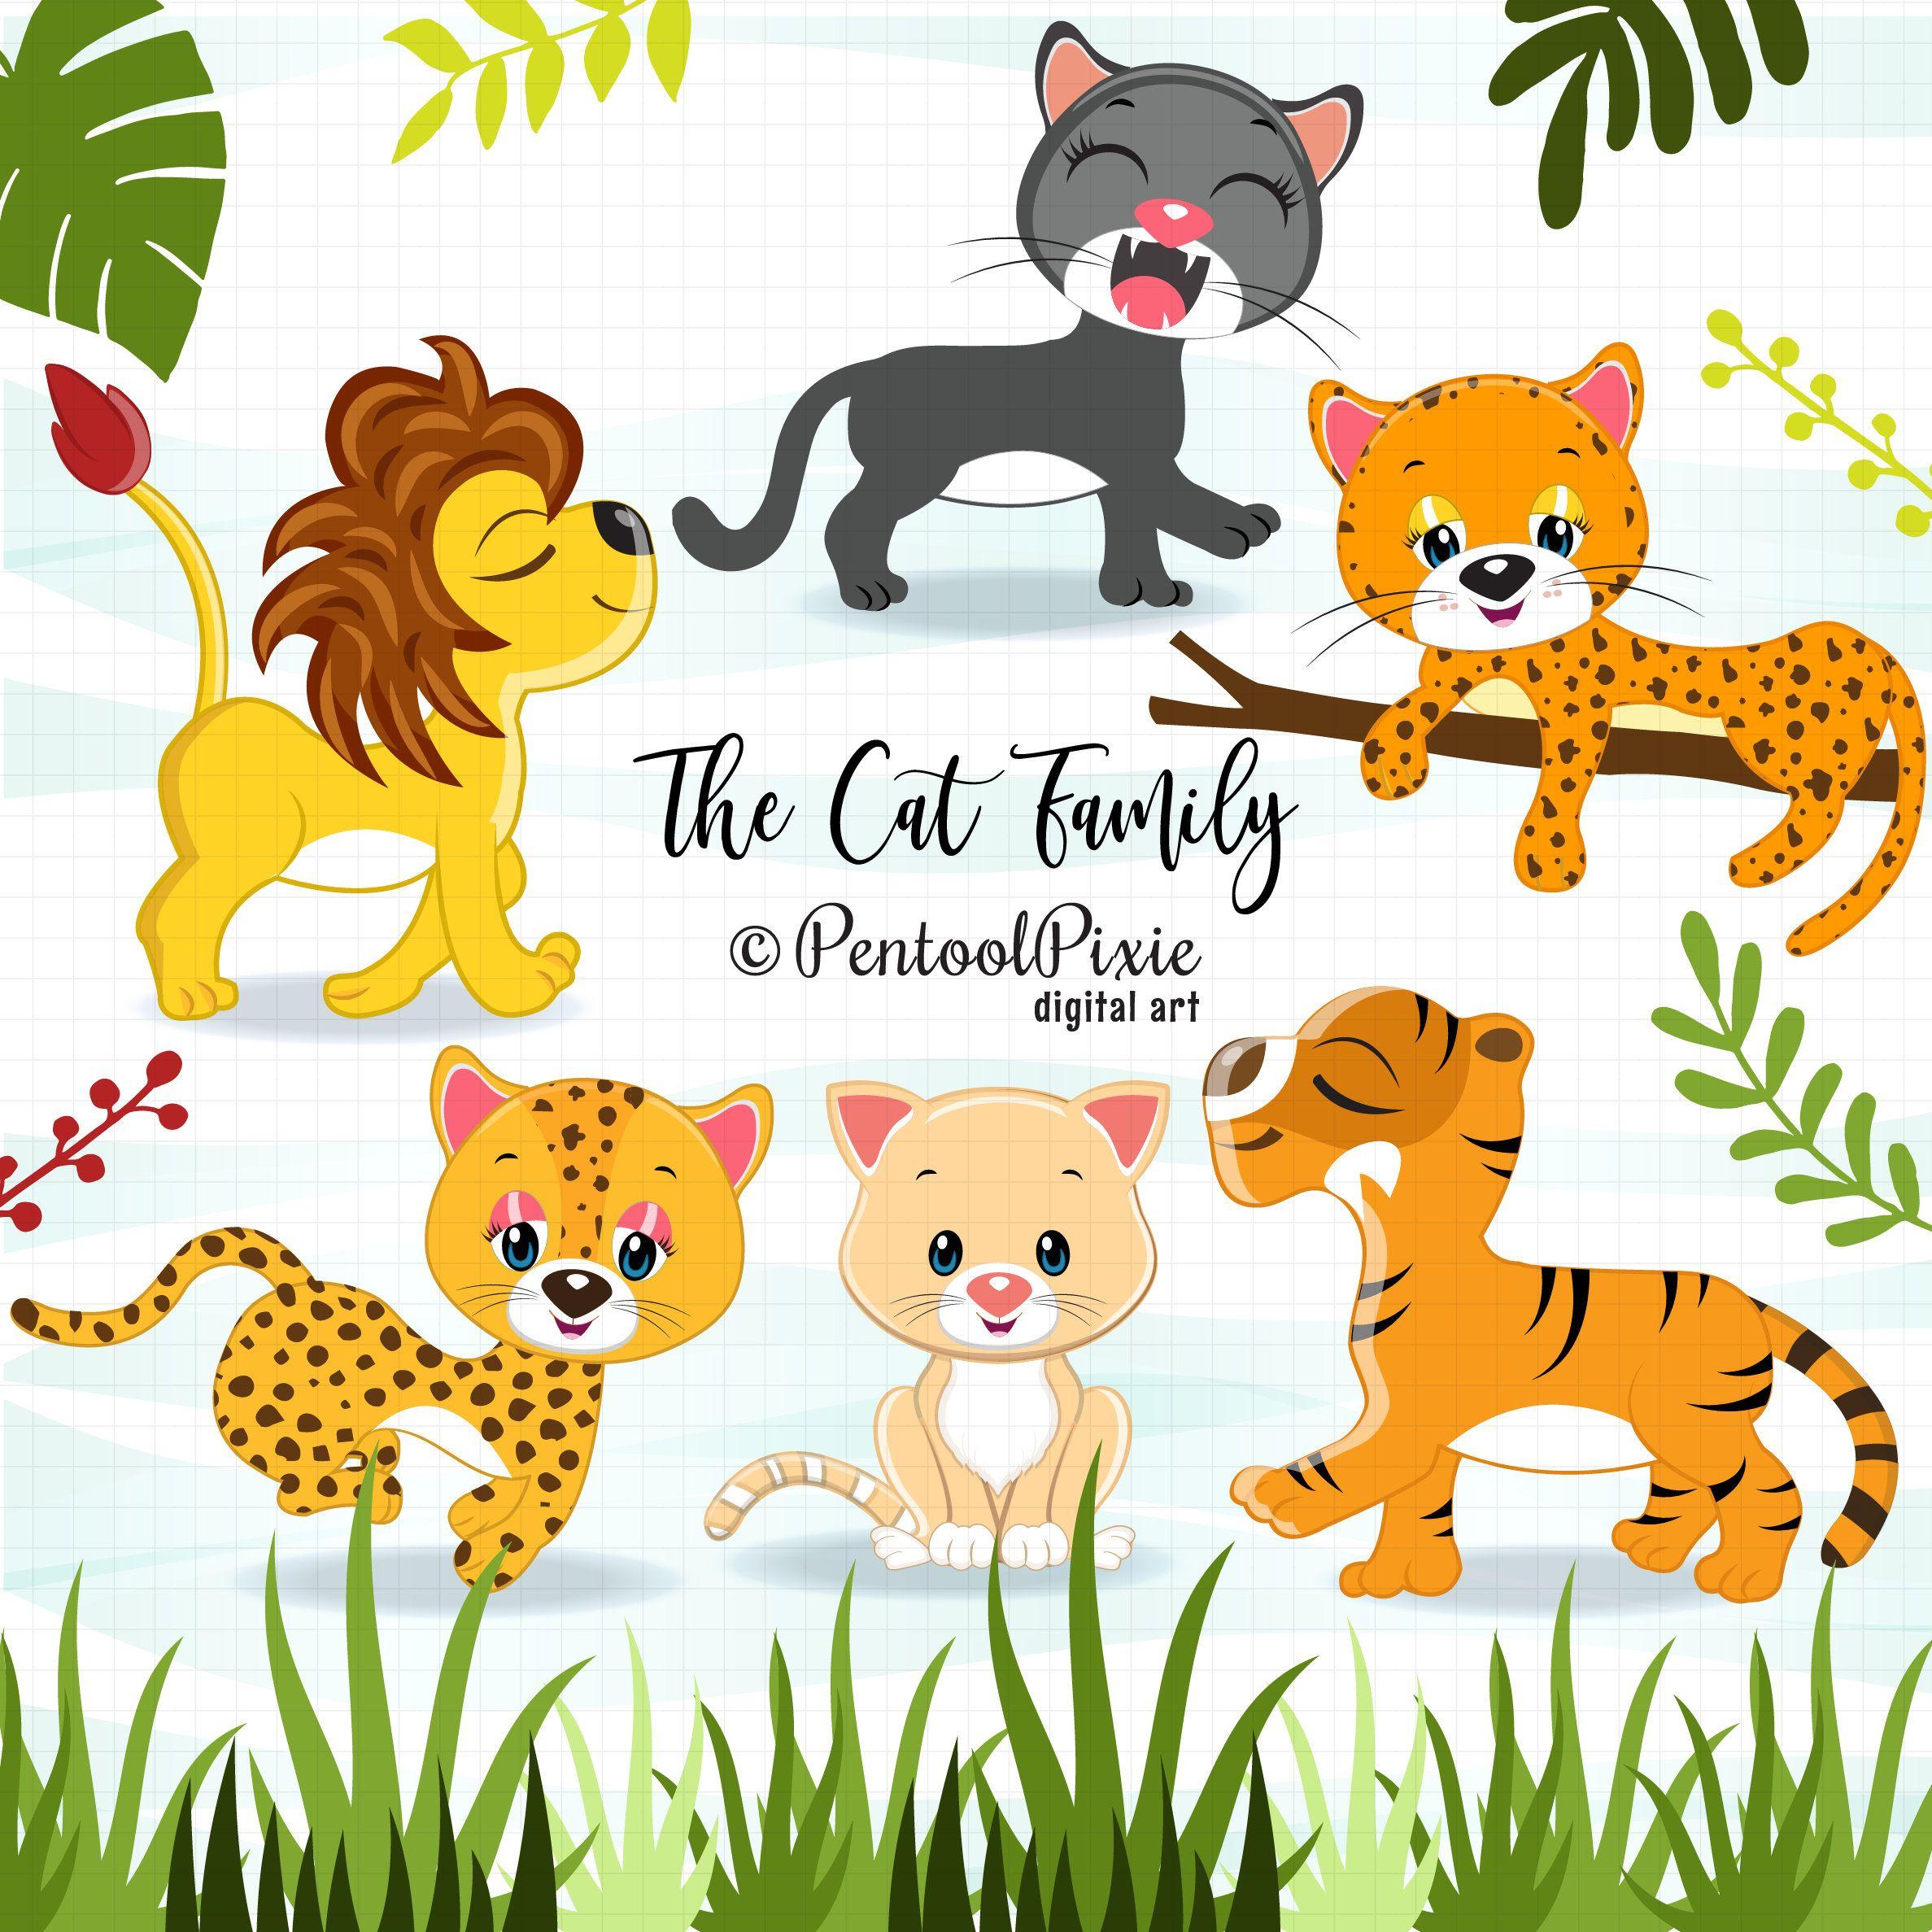 Cat Family Clipart Wild Cats Jungle Animal Clipart Lion Etsy Animal Clipart Cat Family Jungle Animals